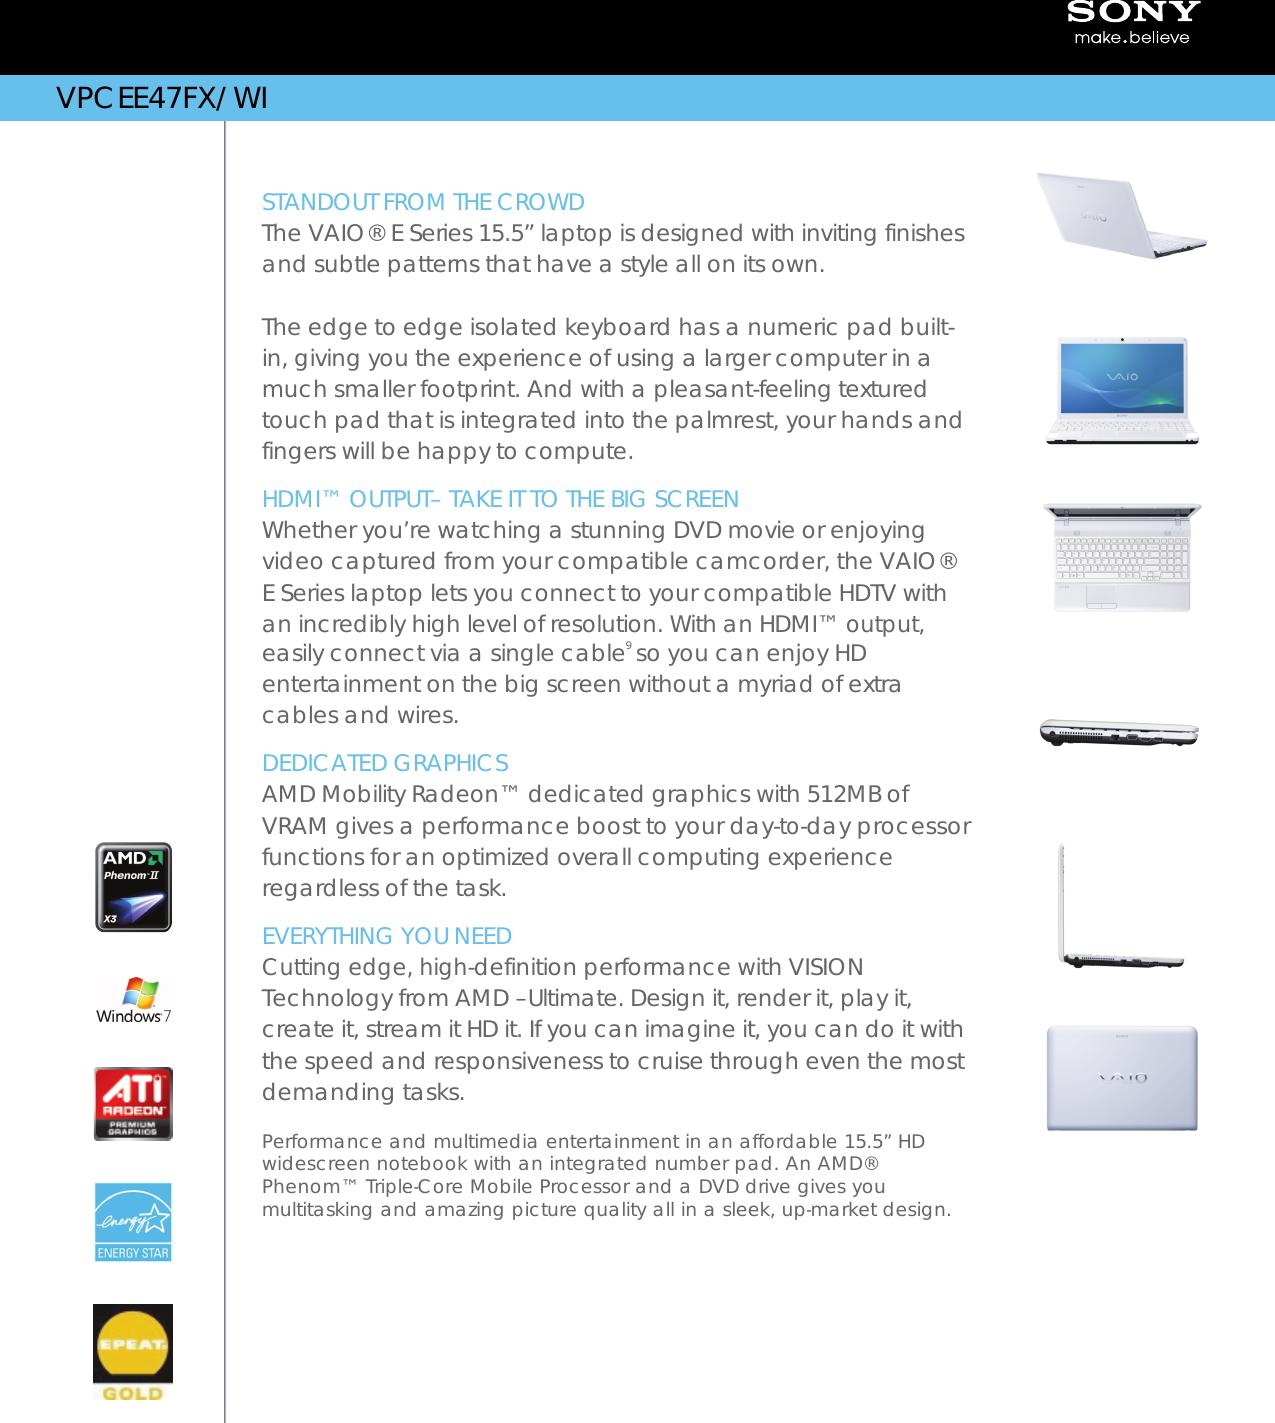 SONY VAIO VPCEE47FXWI ATI MOBILITY RADEON HD GRAPHICS DRIVERS FOR WINDOWS 8